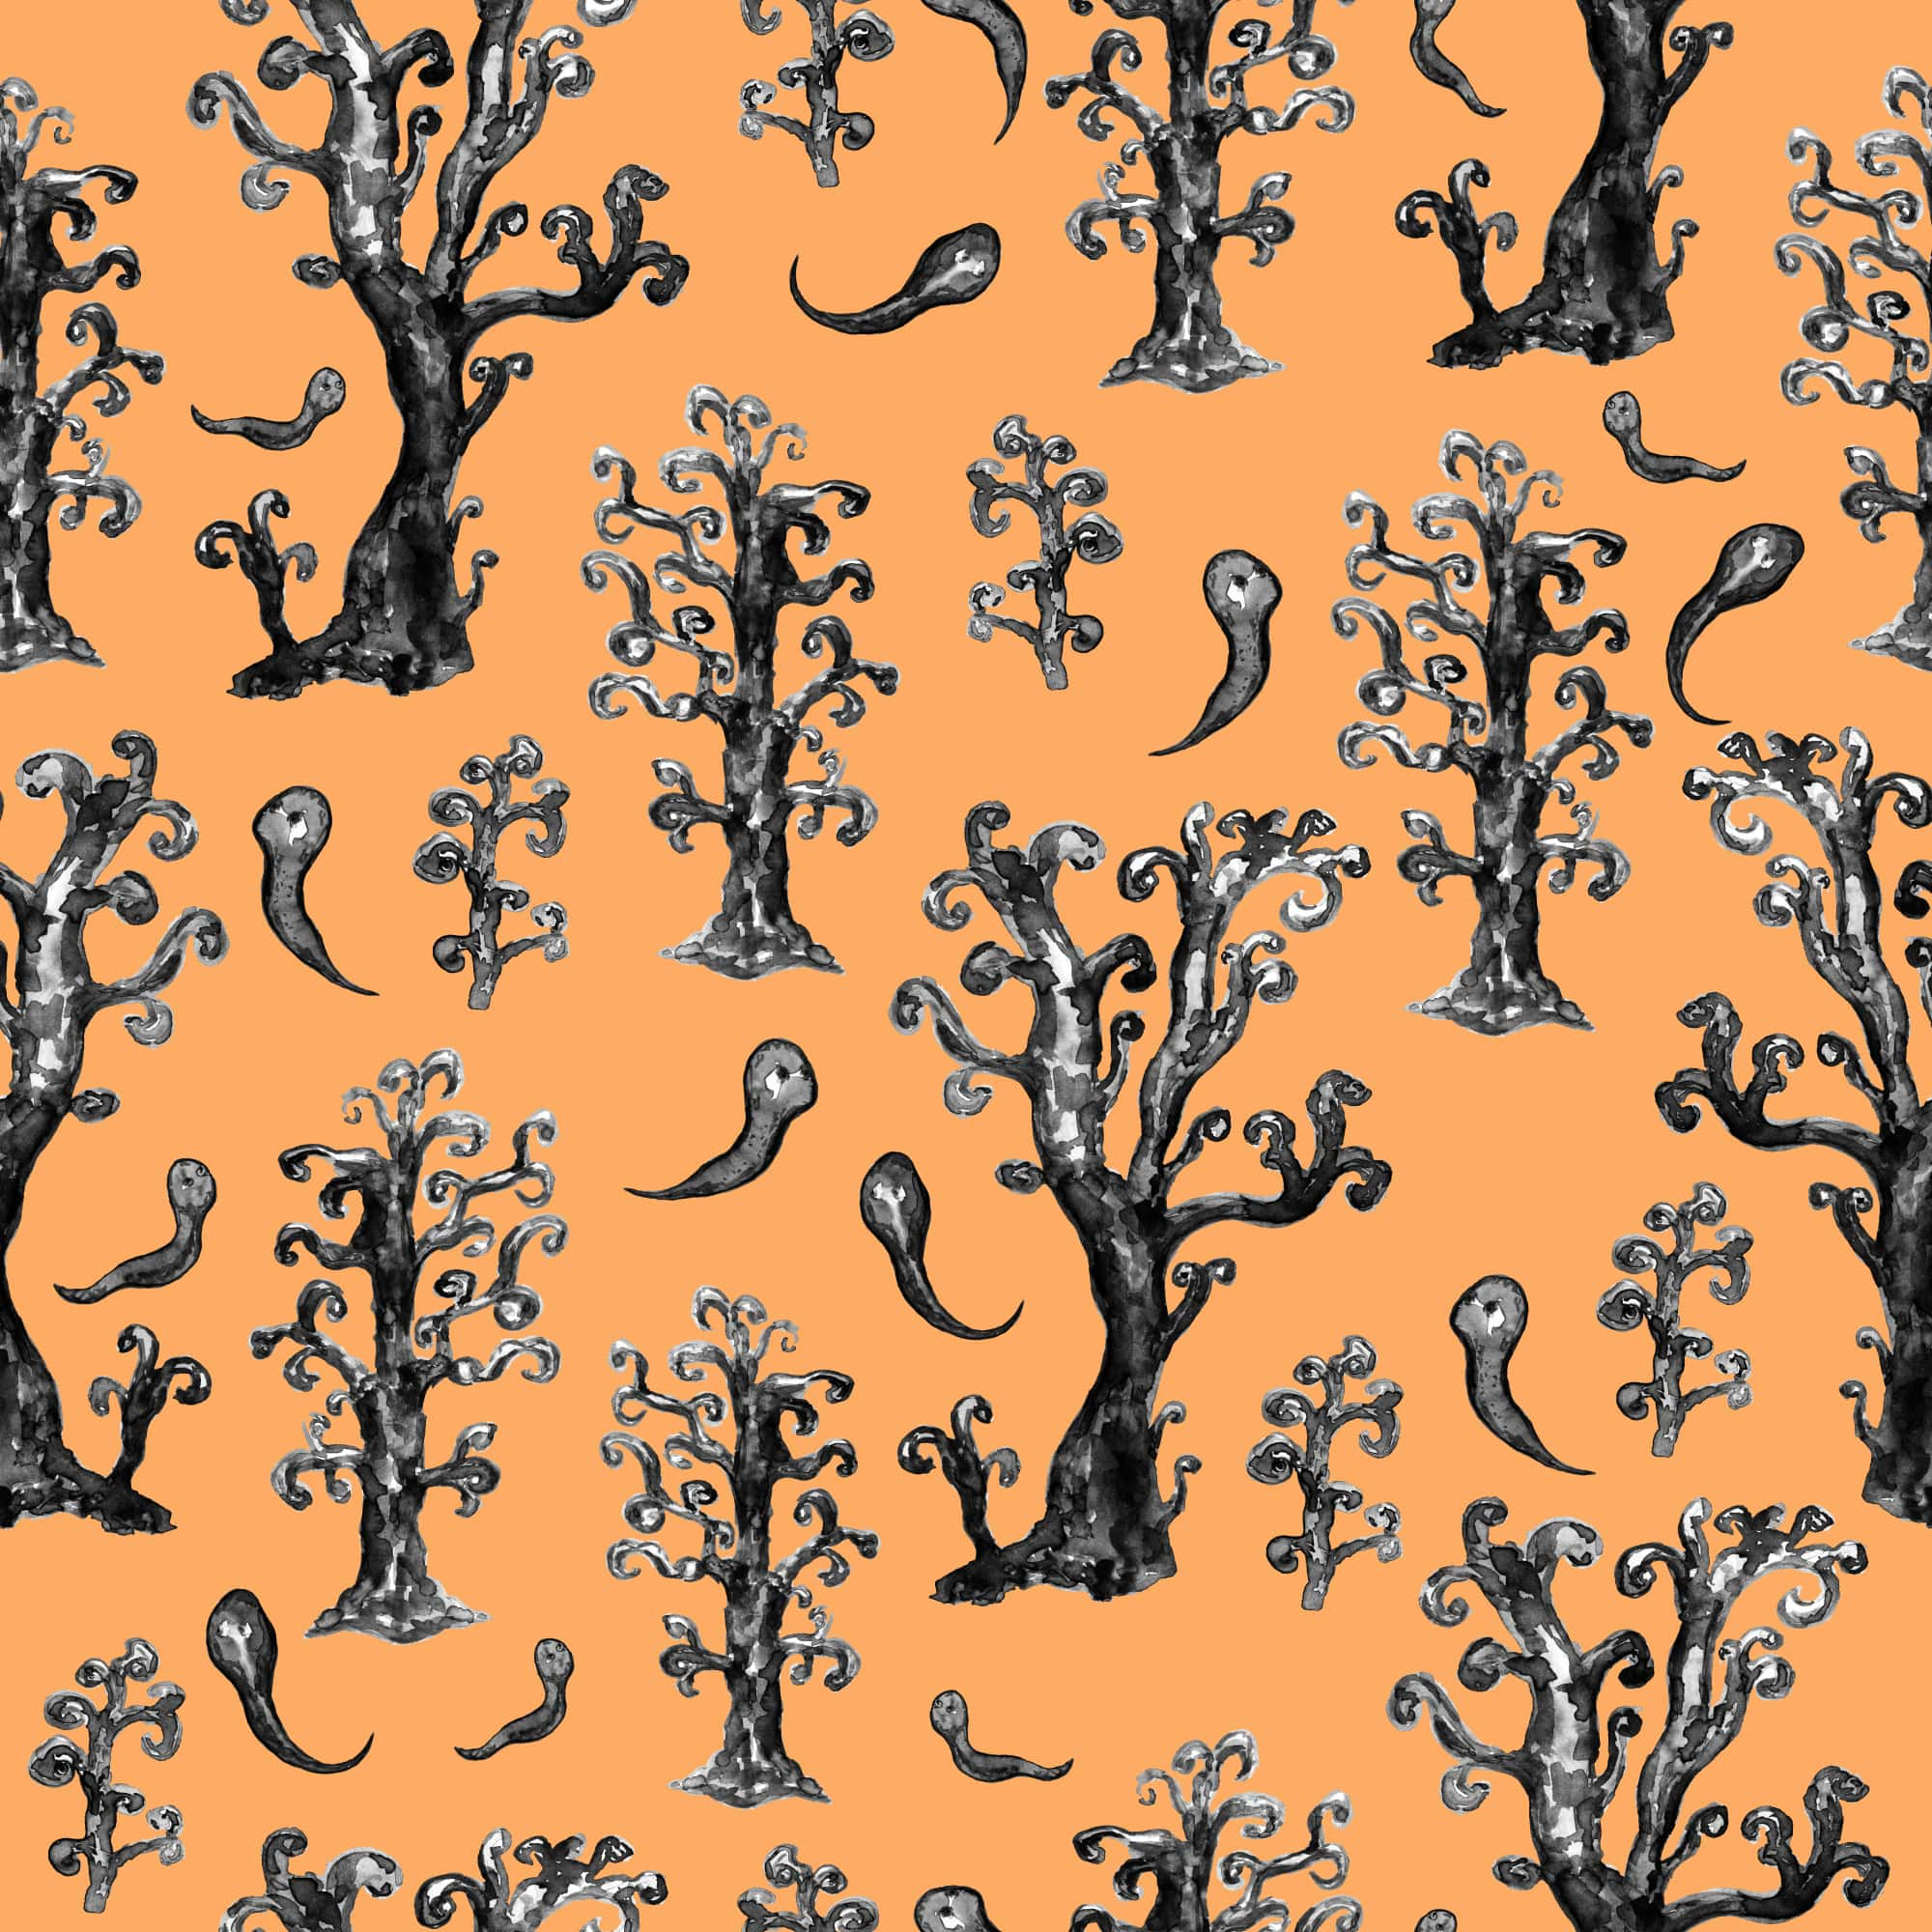 10+ Best Halloween Patterns in 2020:  11 Patterns - just $7 - pattern1 min